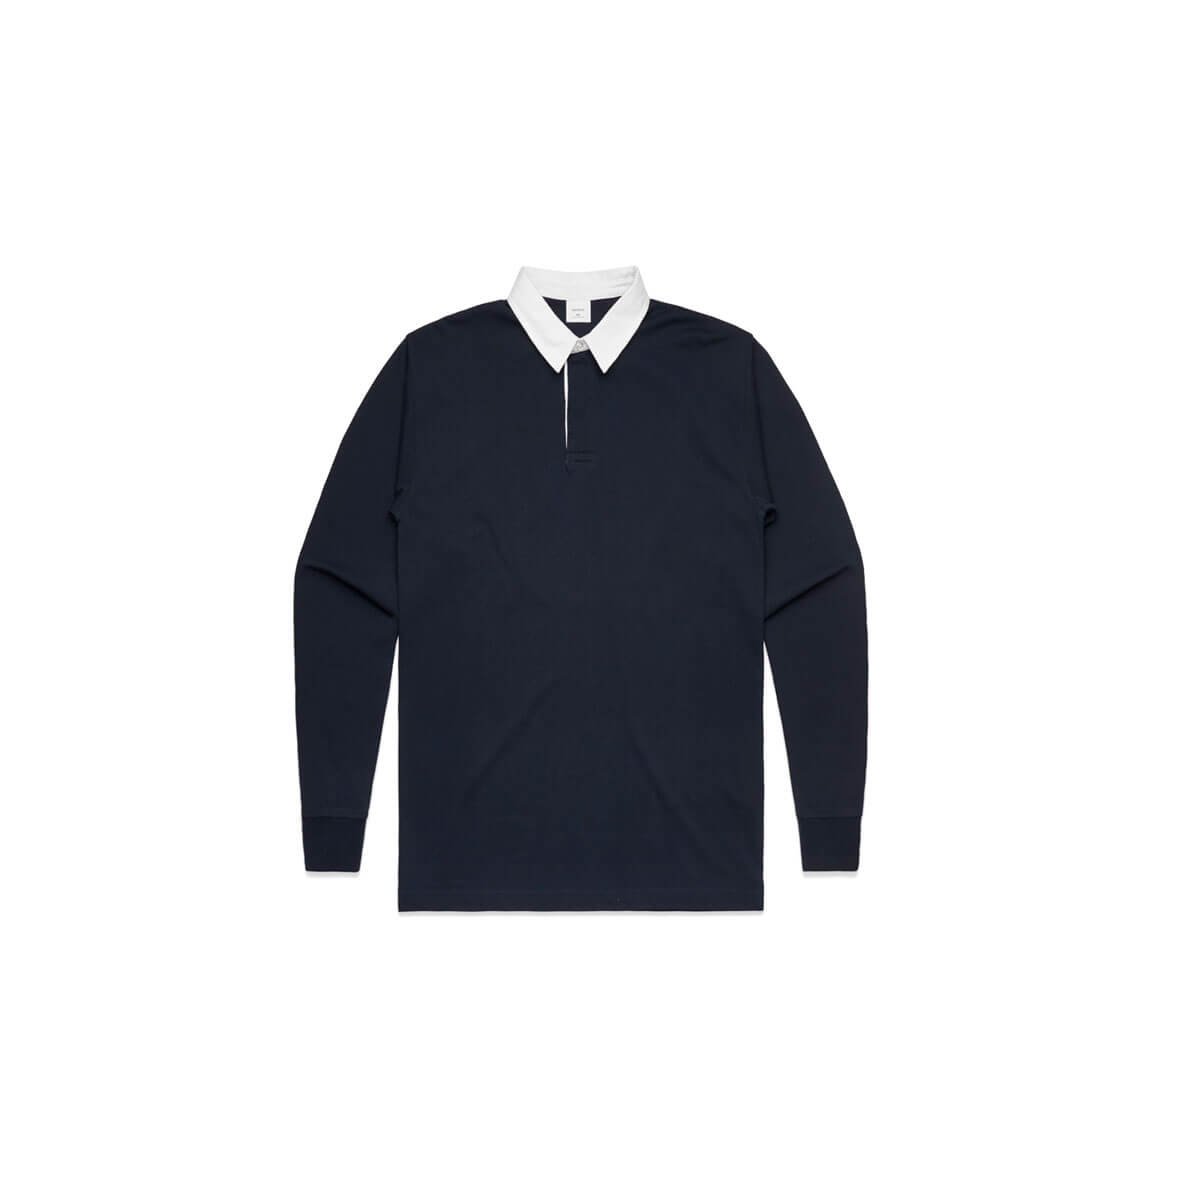 b1632de94 Rugby Jerseys - Custom Clothing